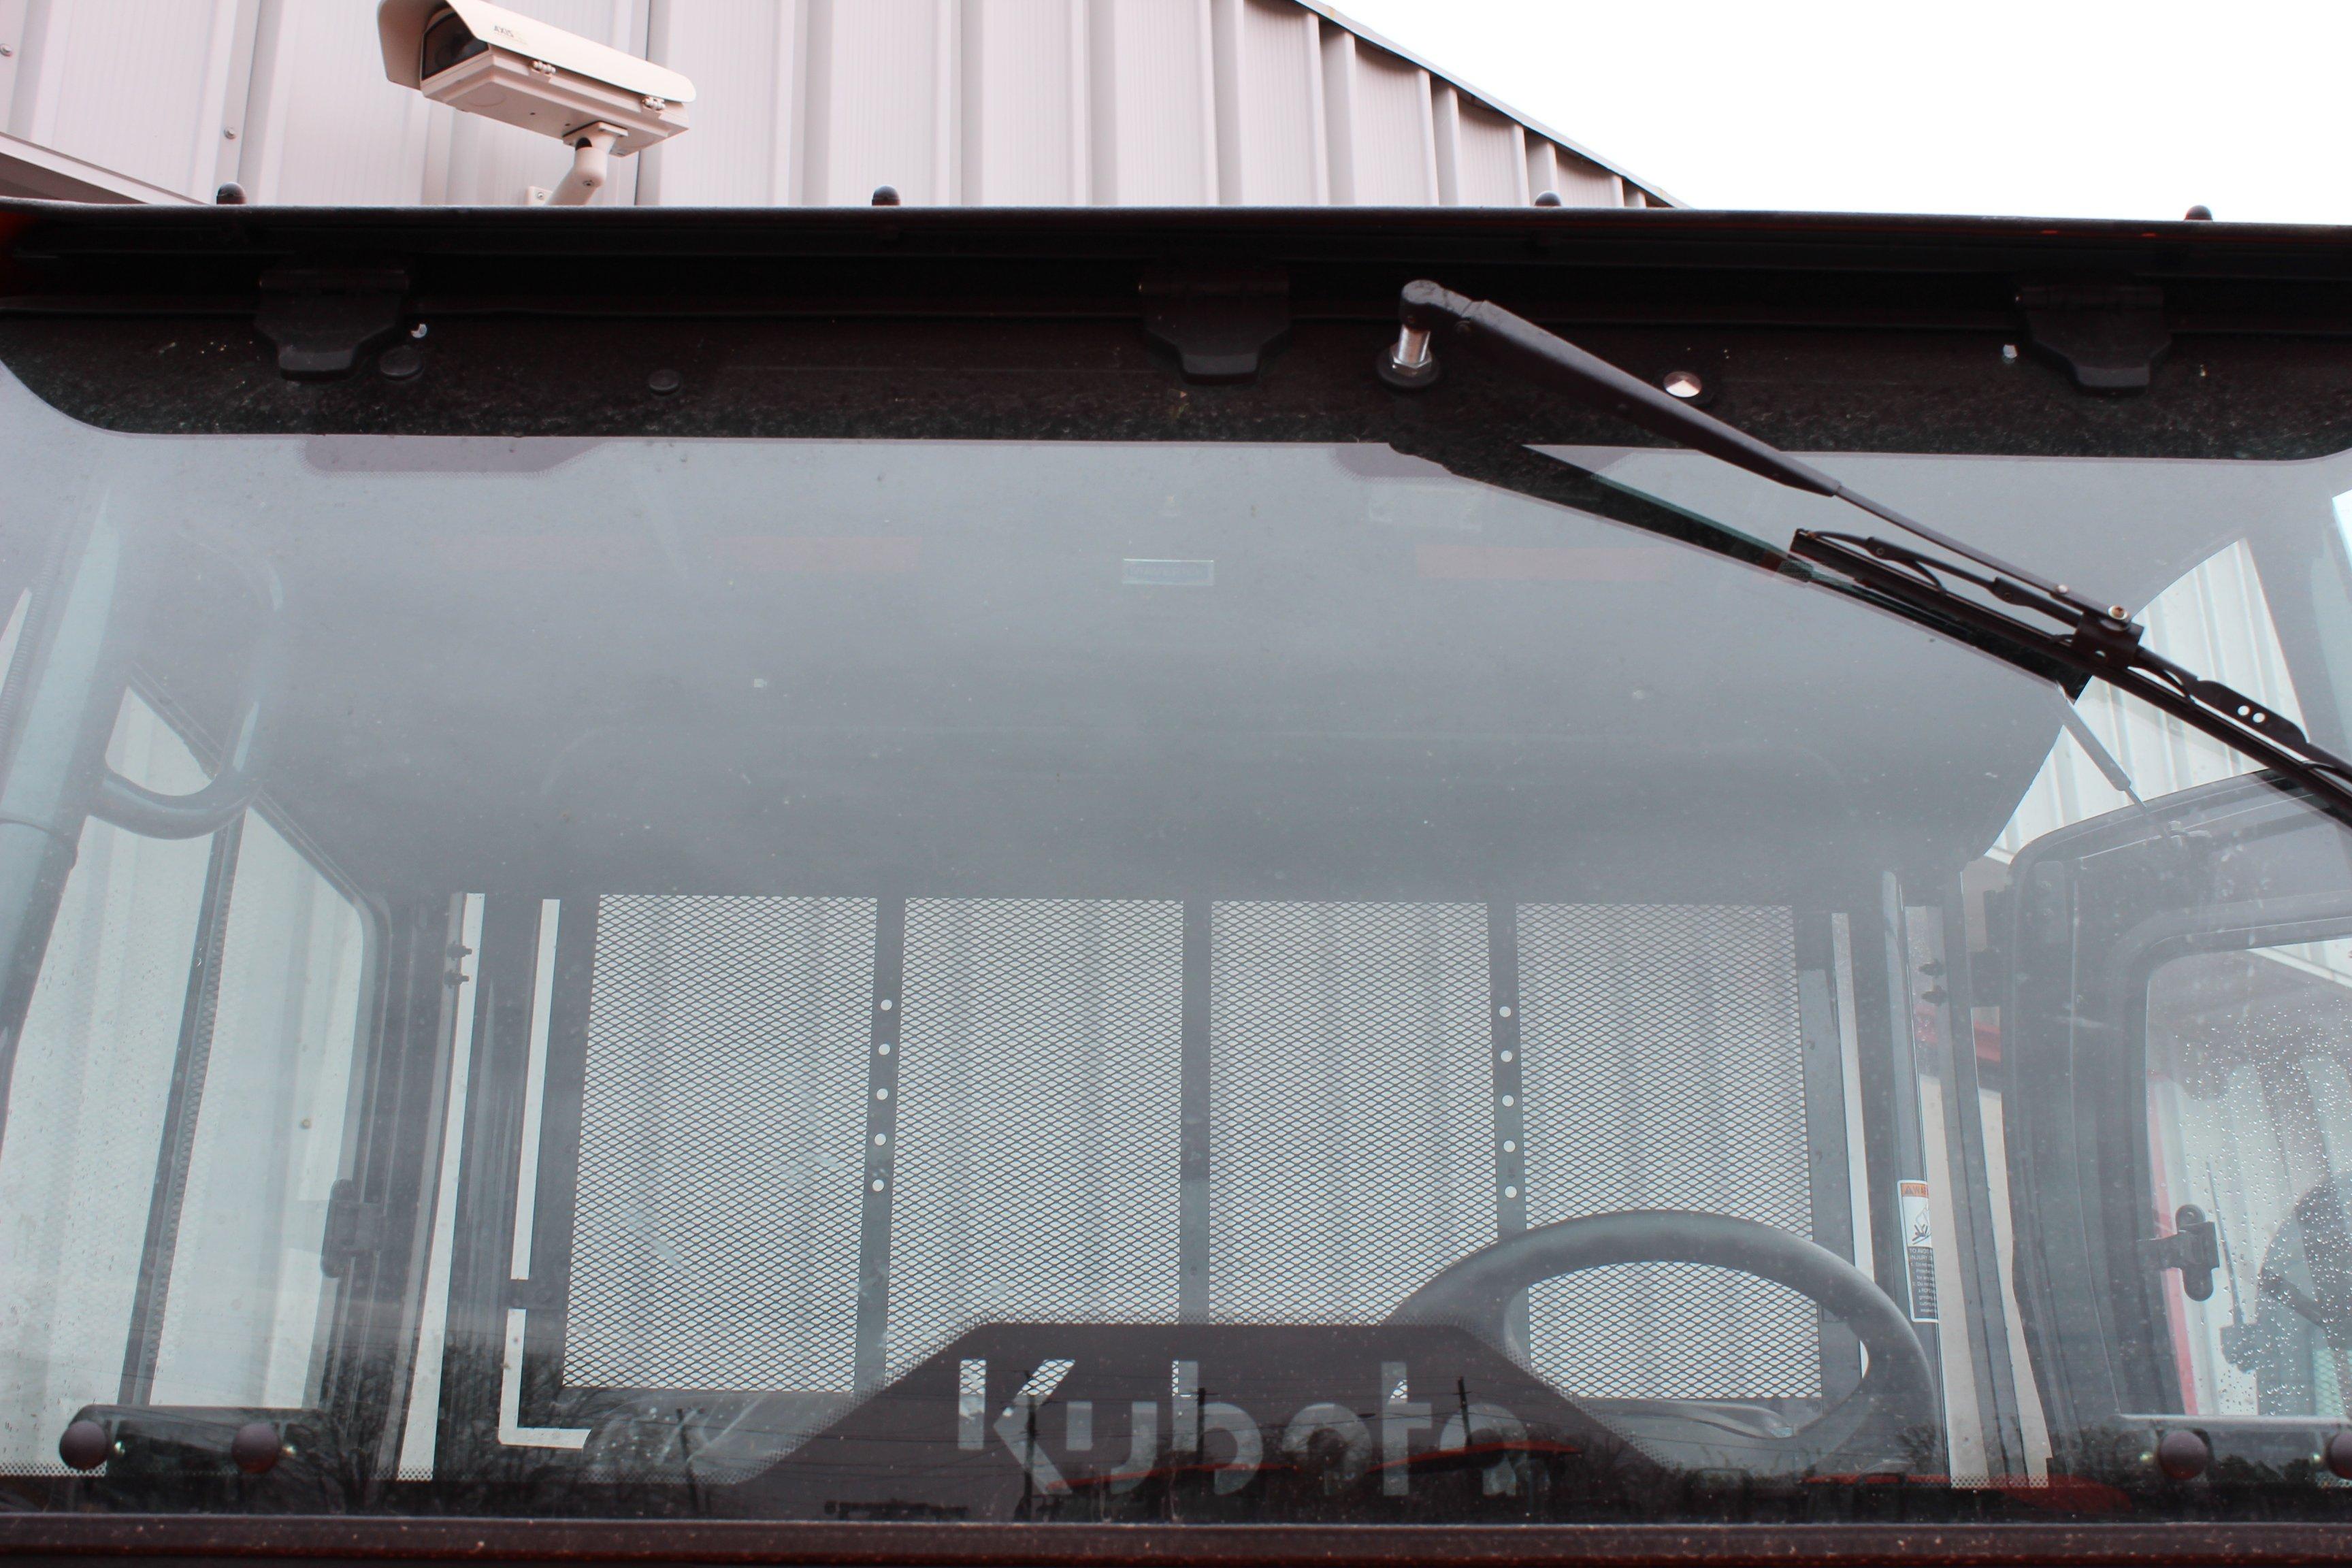 Kubota Tractor Rear View Mirror : Deluxe rear view mirror fits kubota rtv